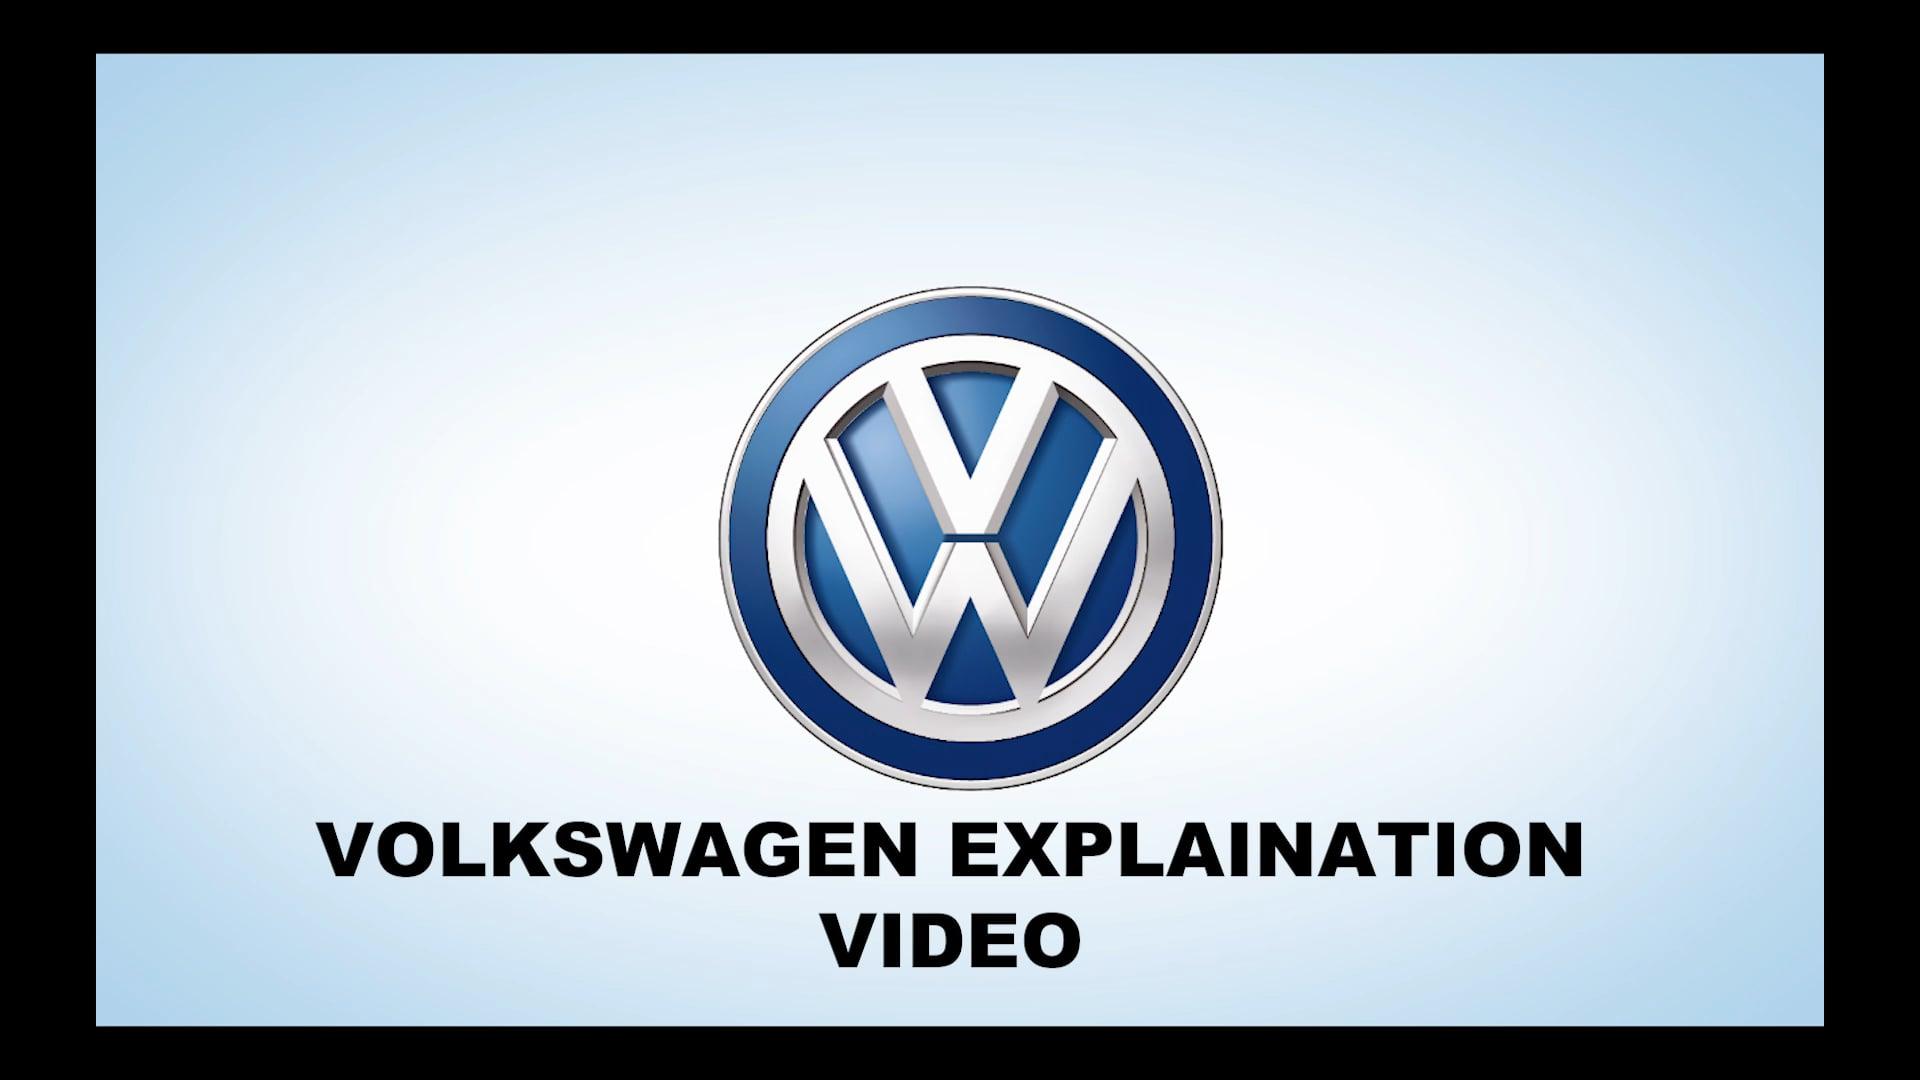 GRAPHICS: VW Explaination Video - no Preview